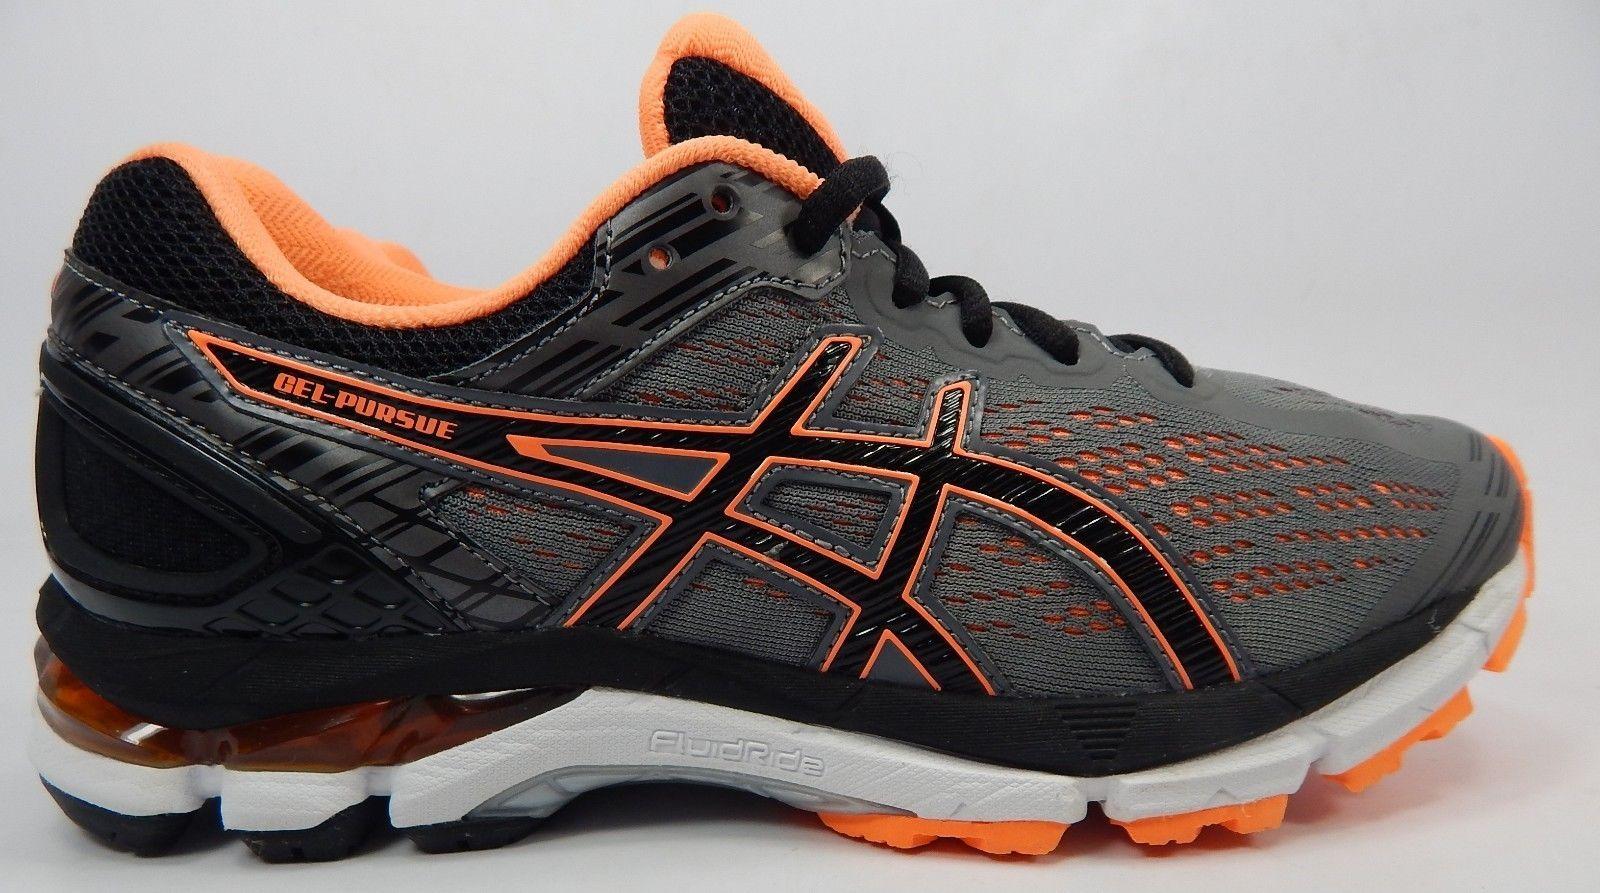 Asics Gel Pursue 3 Size US 6.5 M (D) EU 39.5 Men's Running Shoes Gray T6C0N